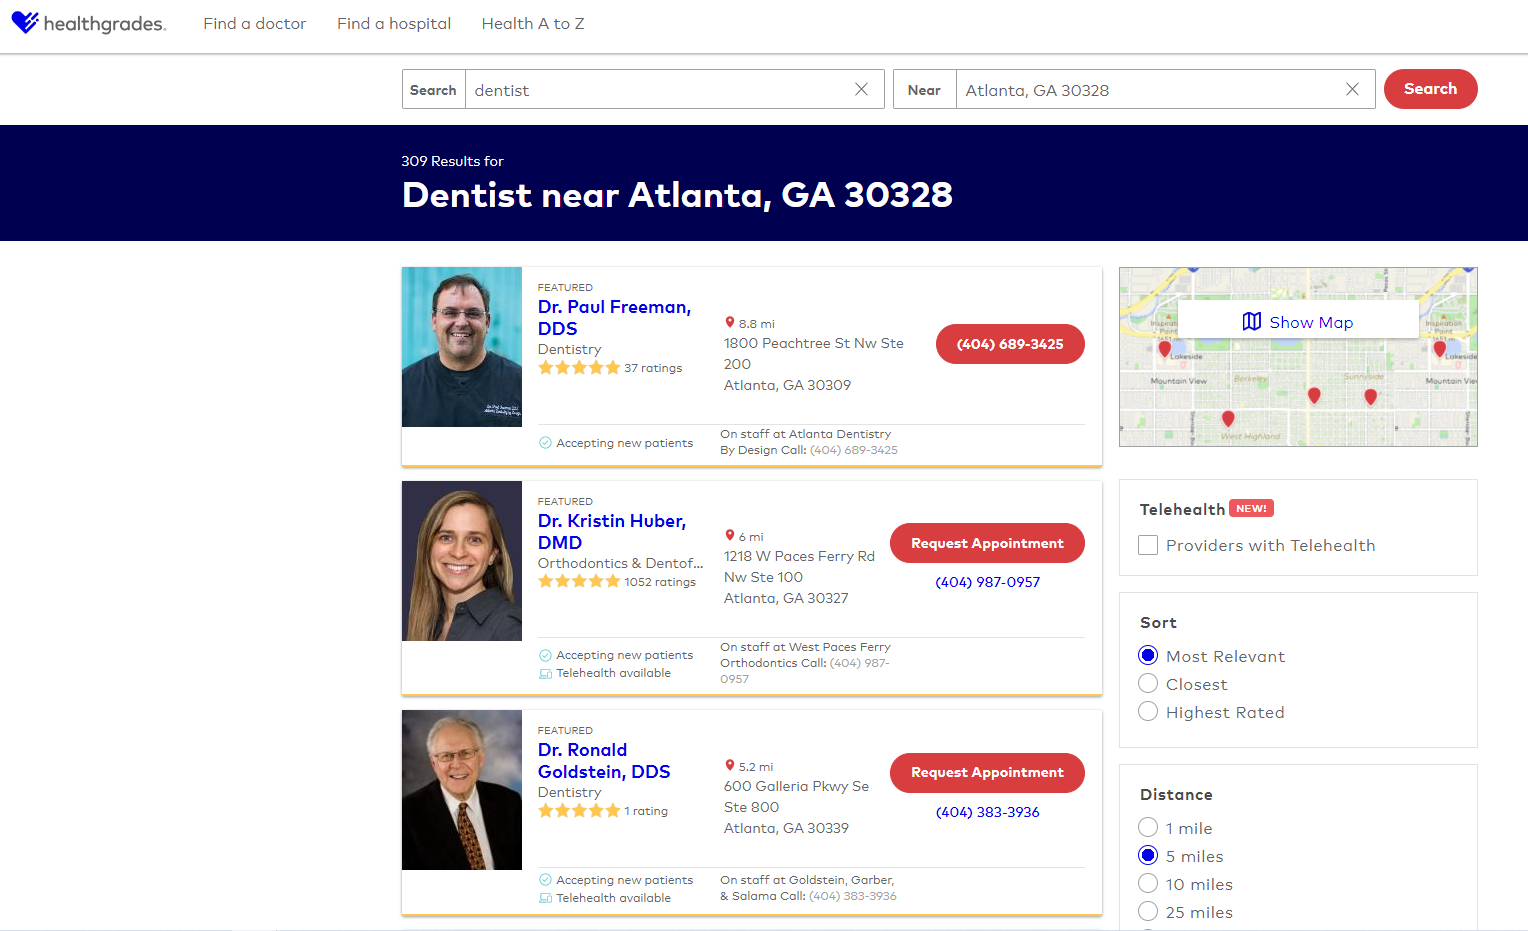 Healthgrade for dentists